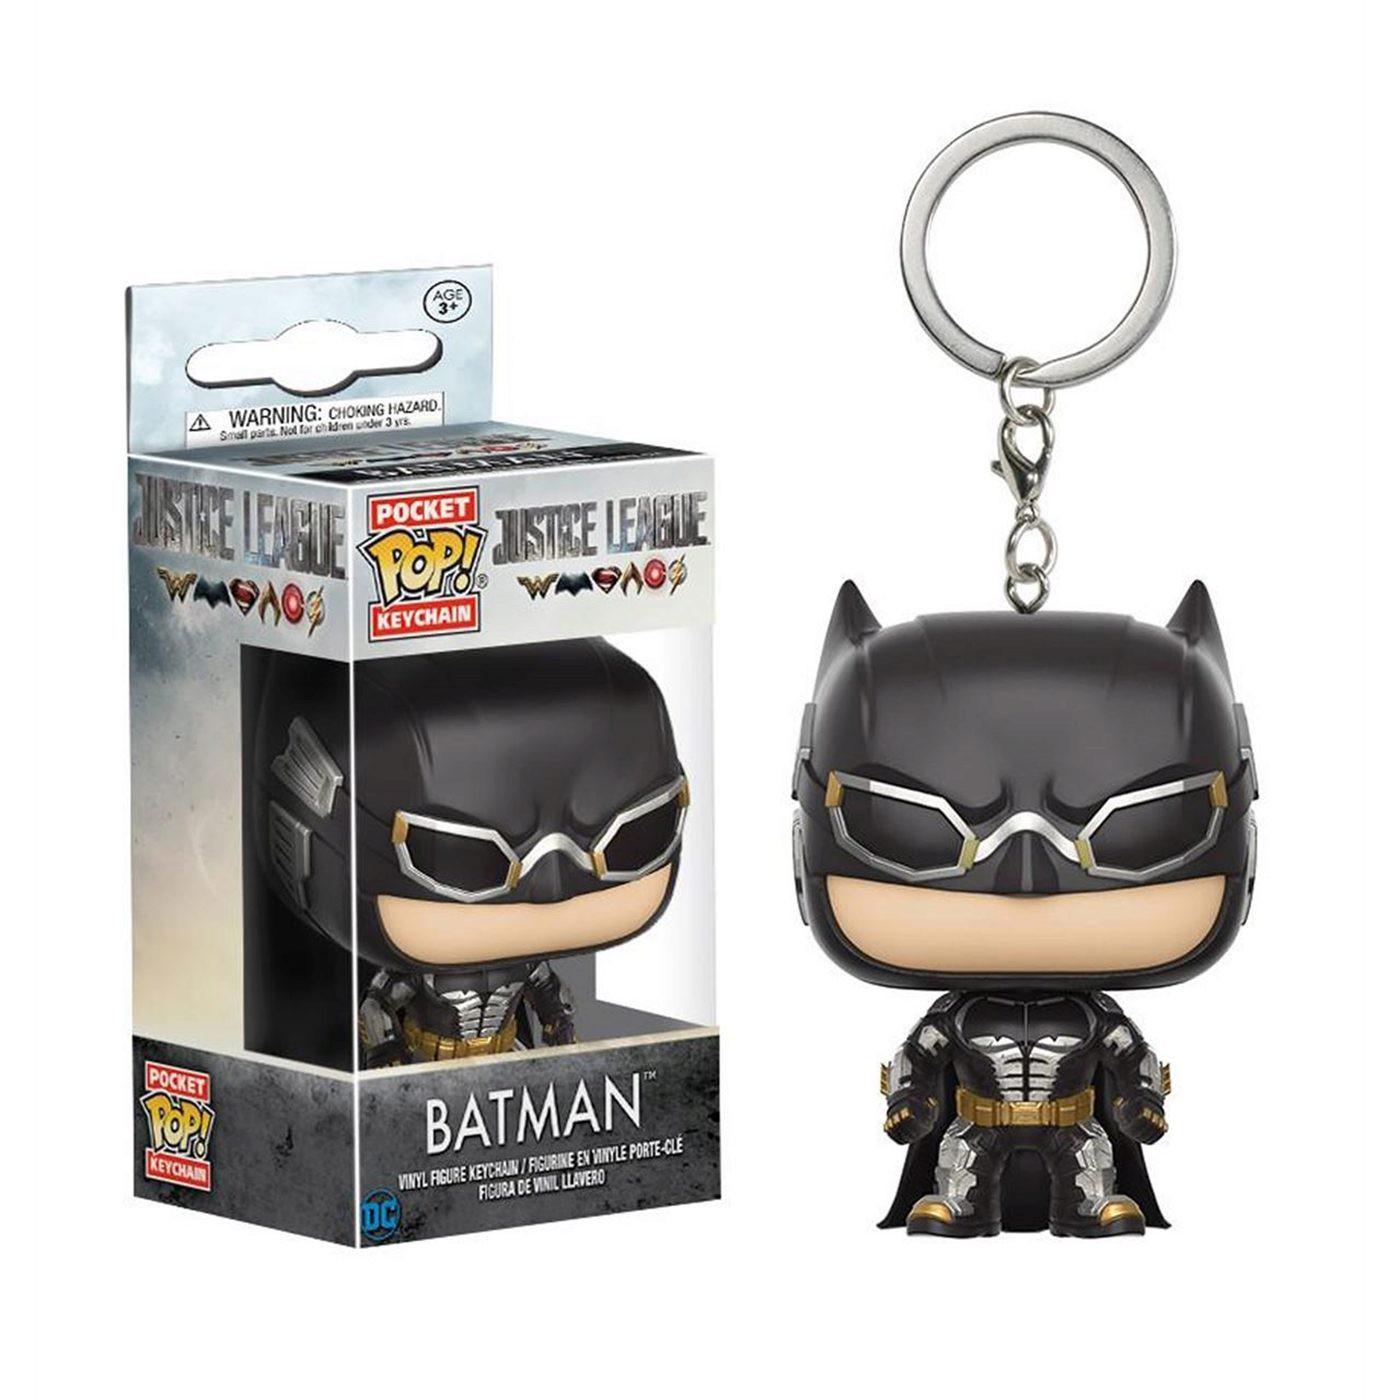 Batman Justice League Movie Pocket Pop Keychain